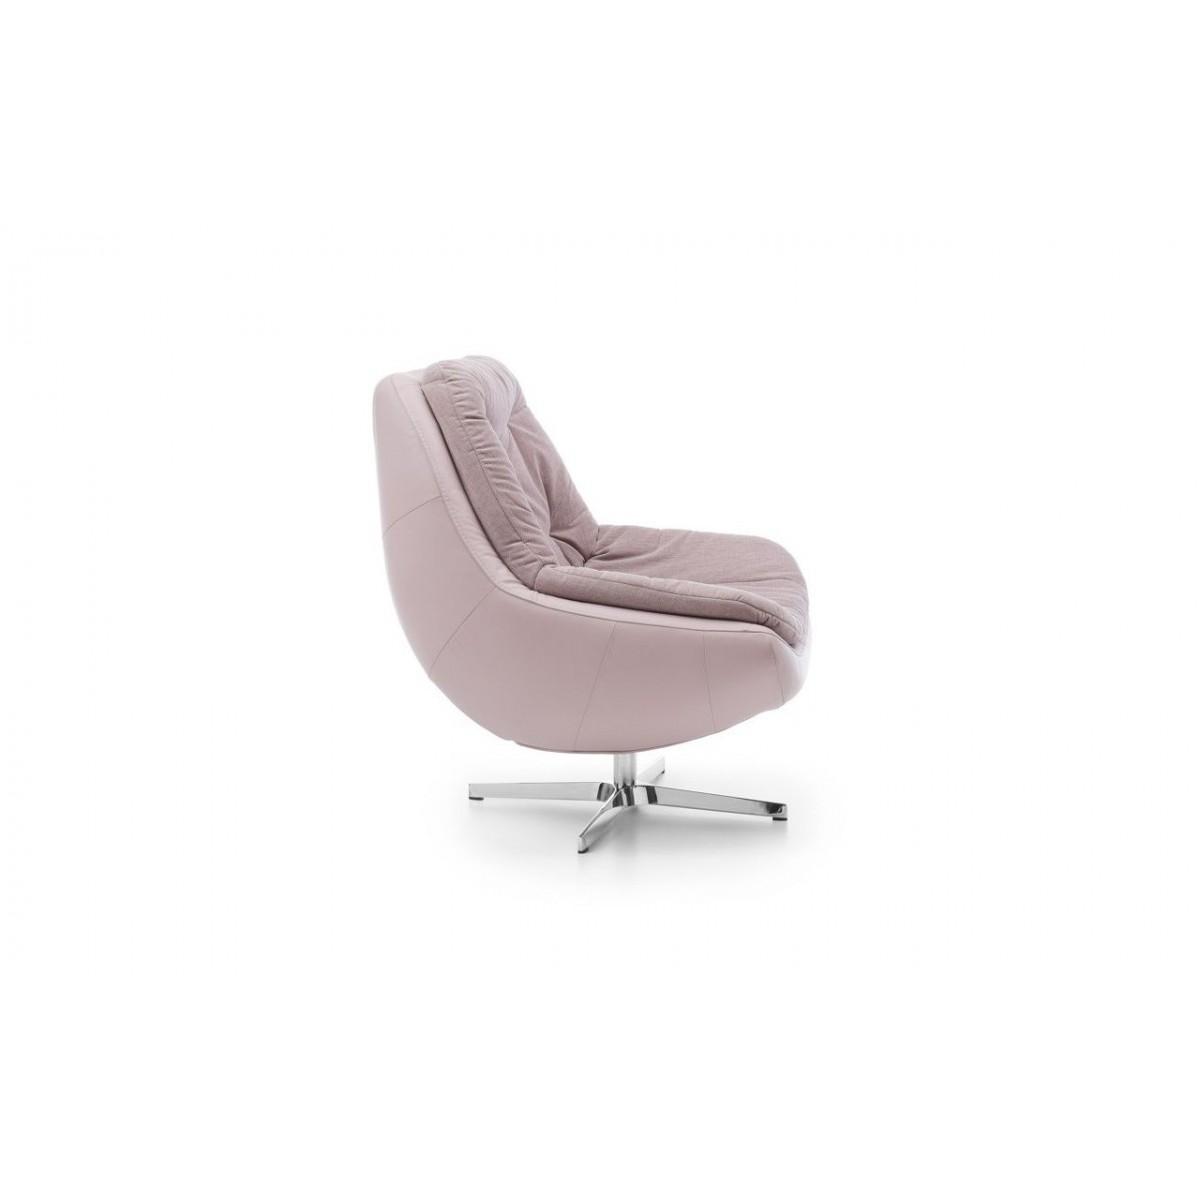 Dim fotel 89cm